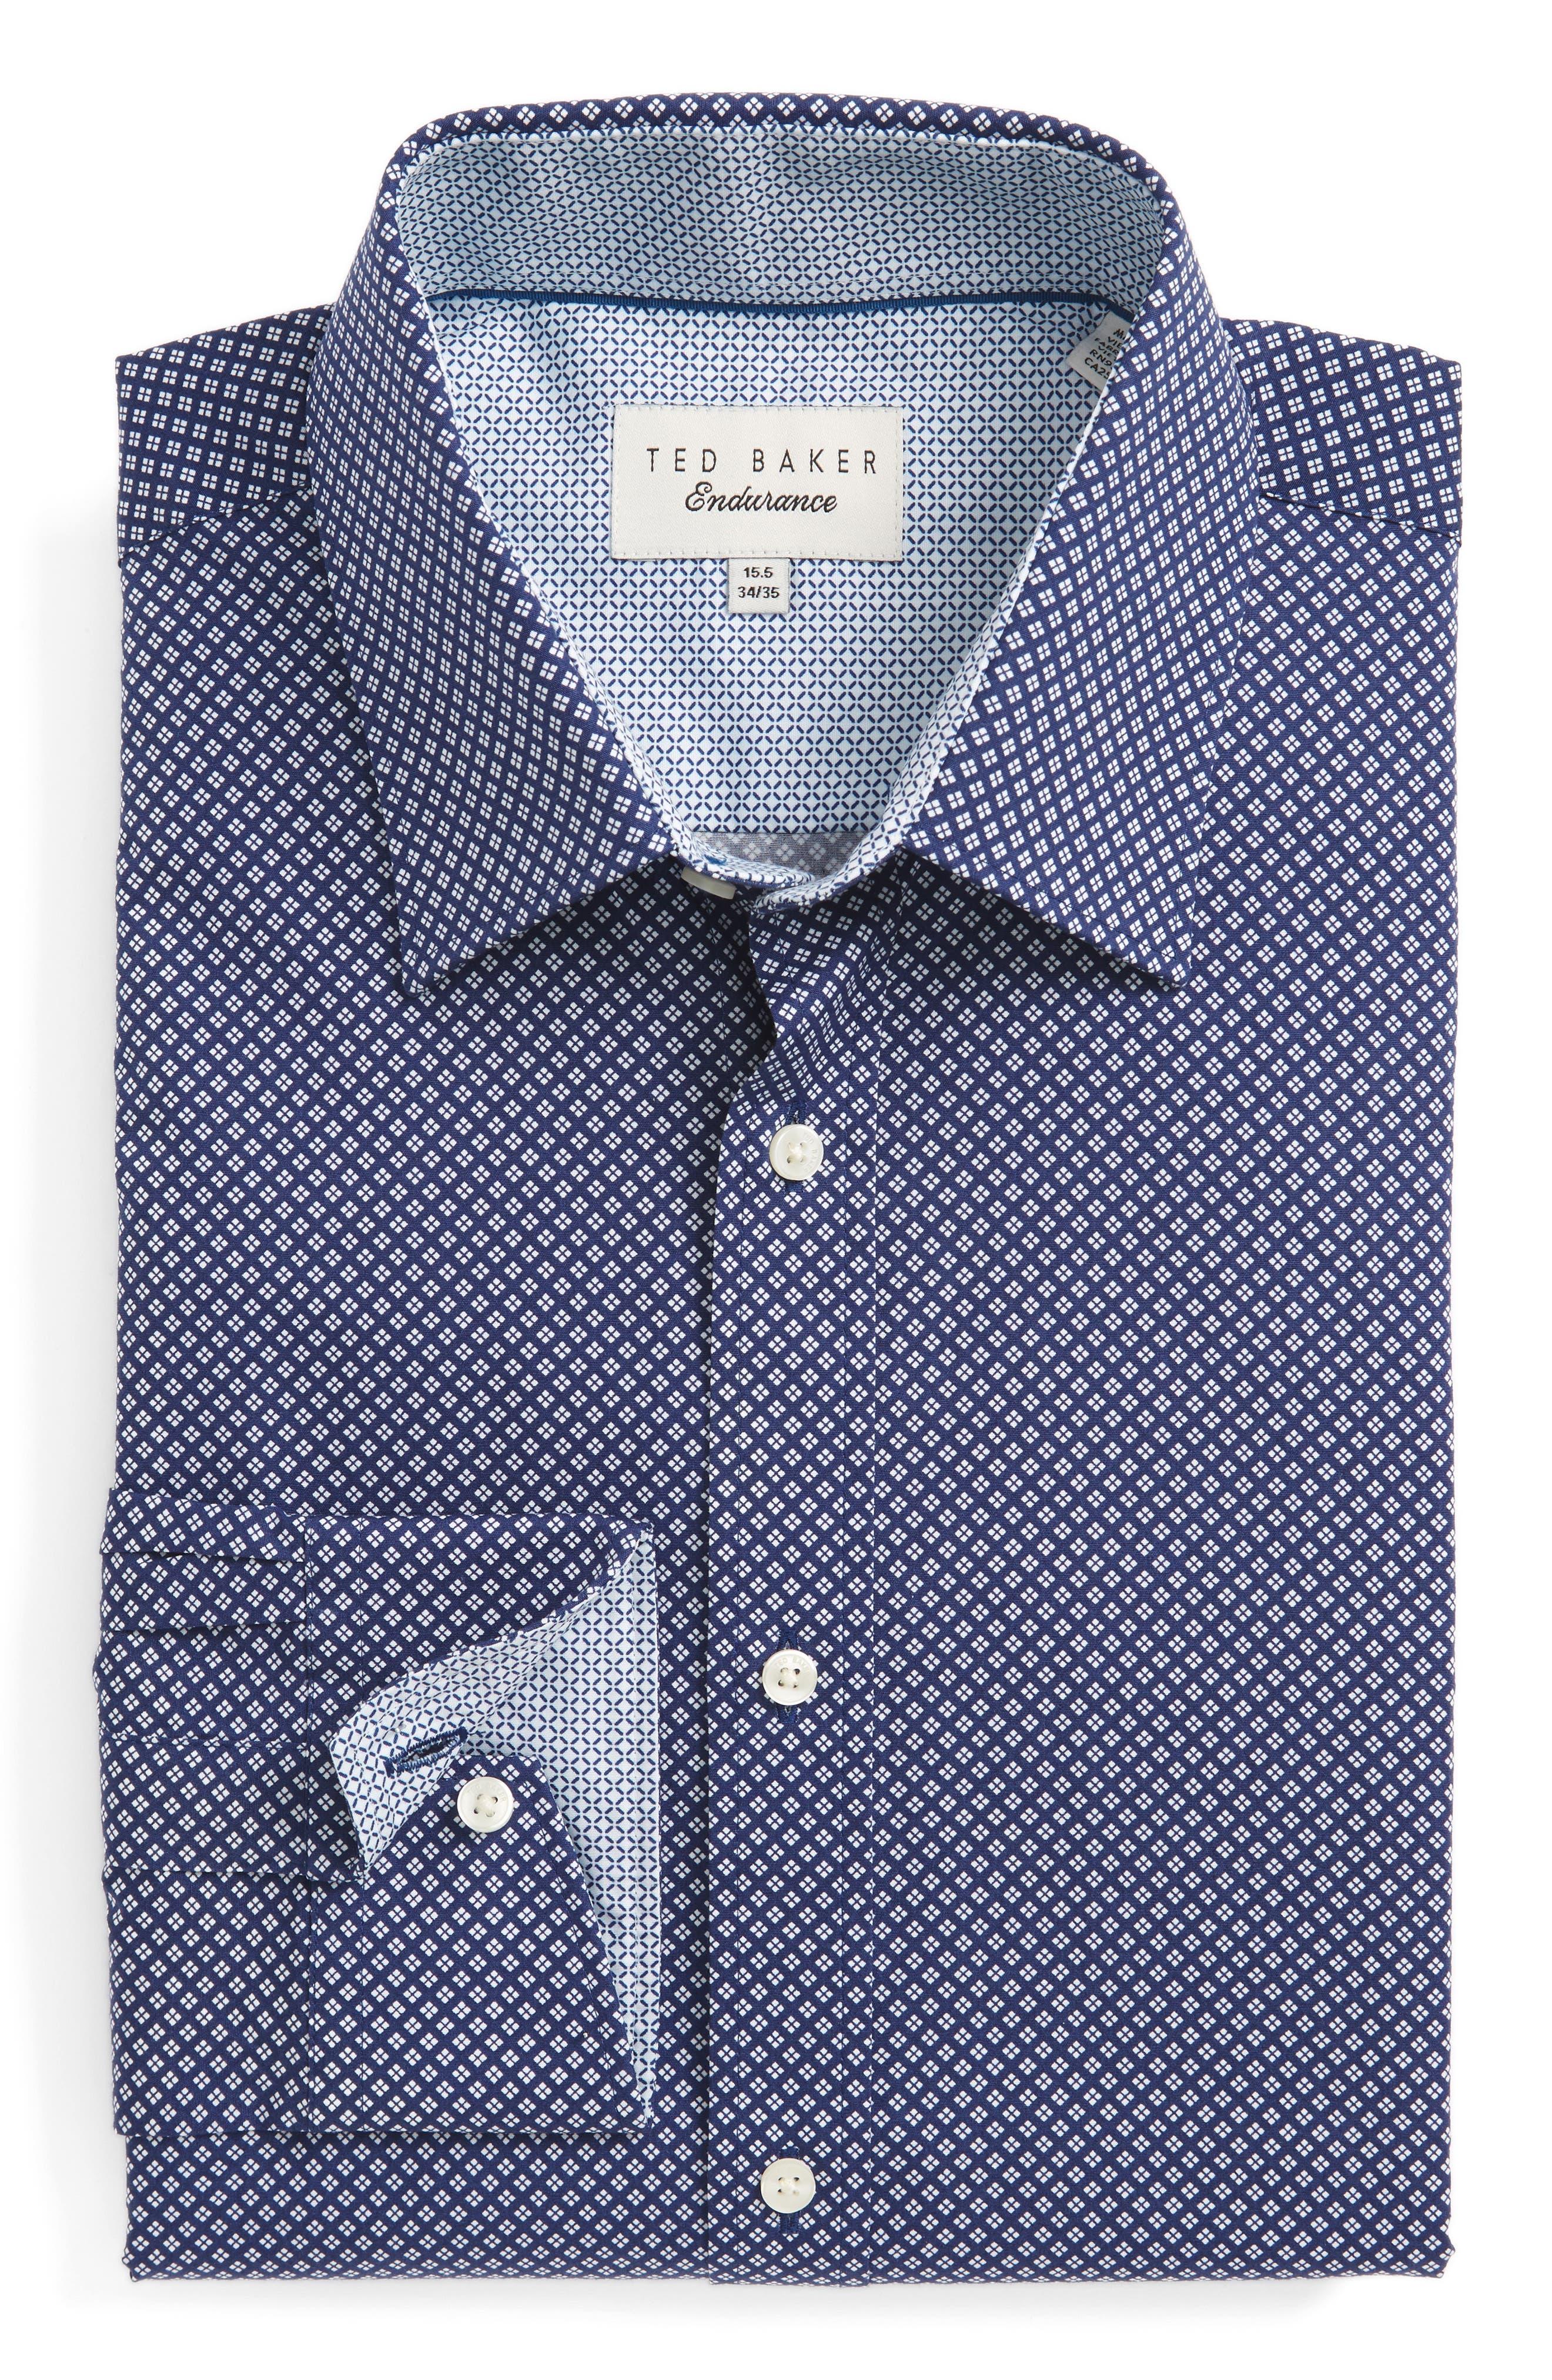 Alternate Image 1 Selected - Ted Baker London Agra Trim Fit Geometric Dress Shirt